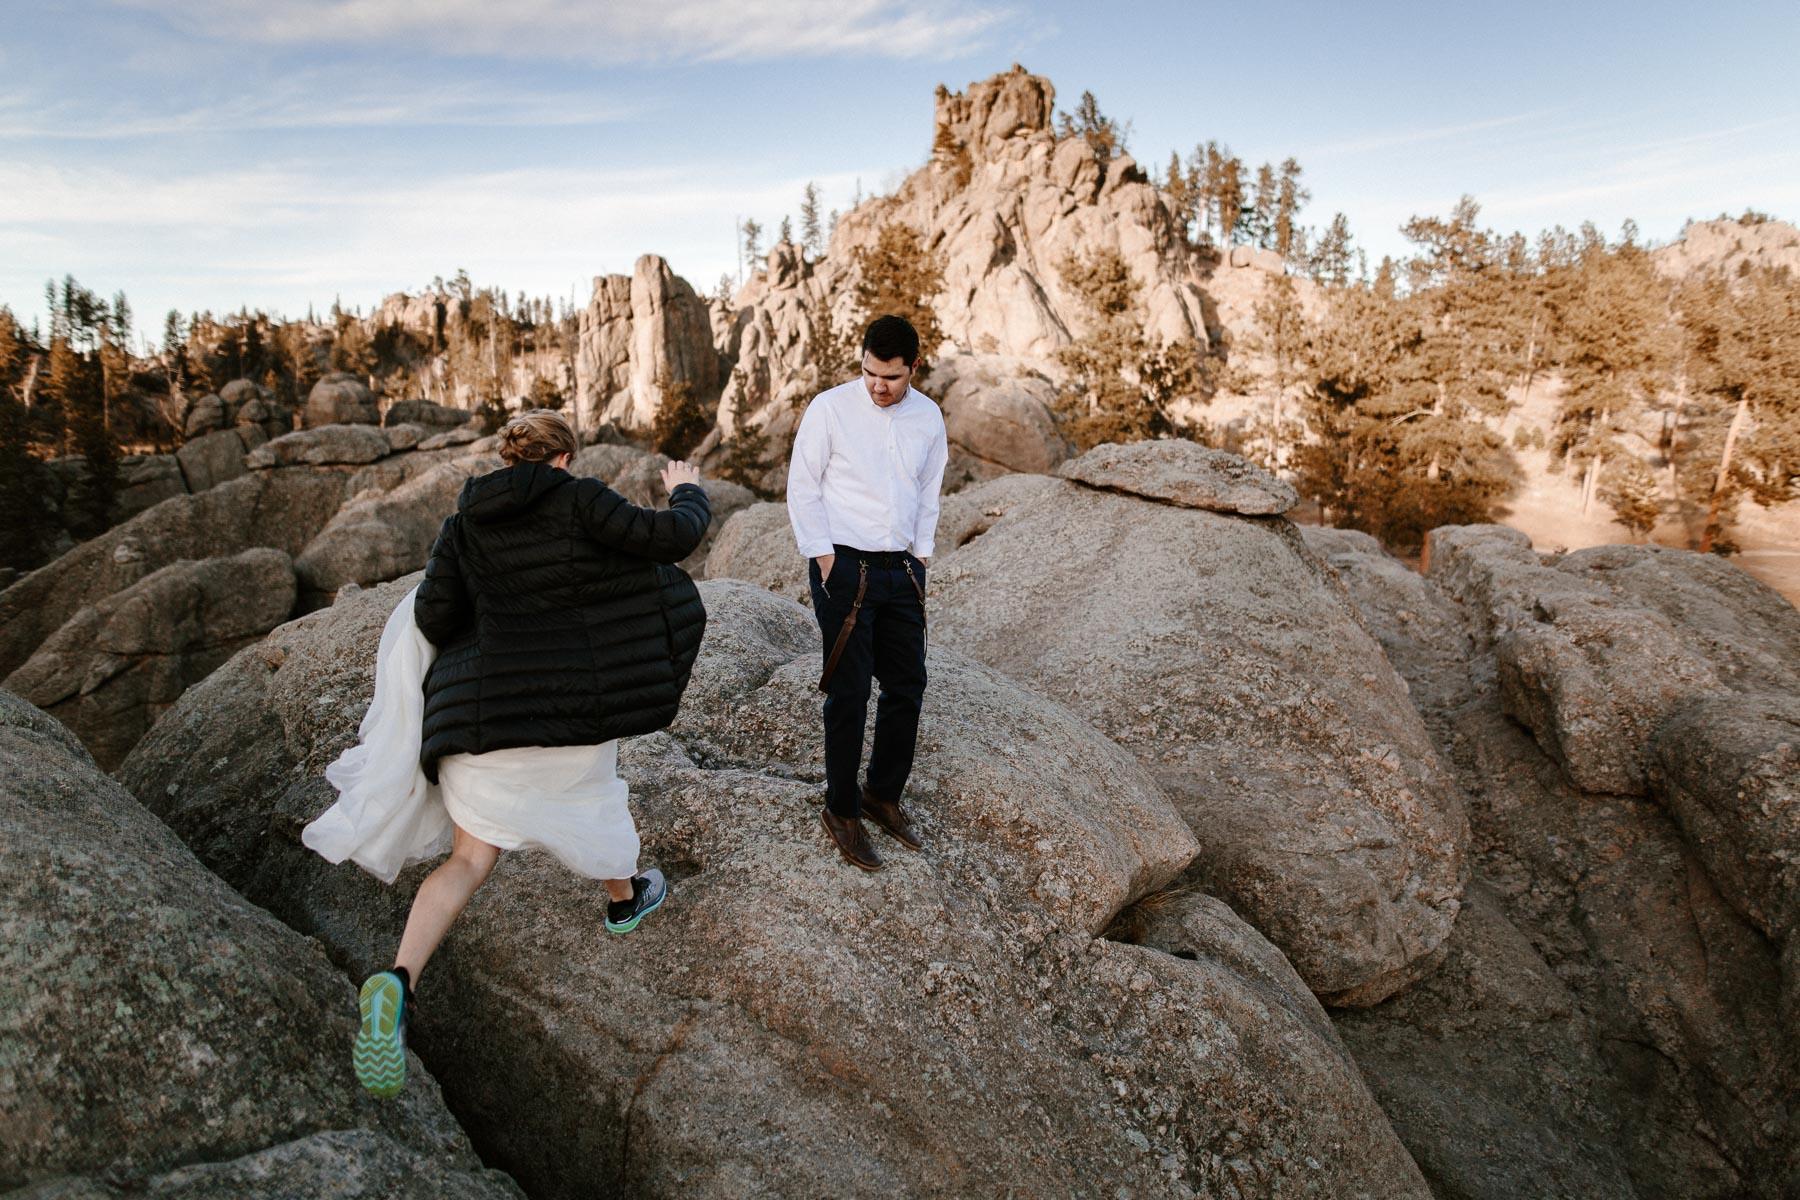 sioux-falls-black-hills-rapid-city-elopement-wedding-adventure-photographer-custer-sylvan-lake-36.jpg